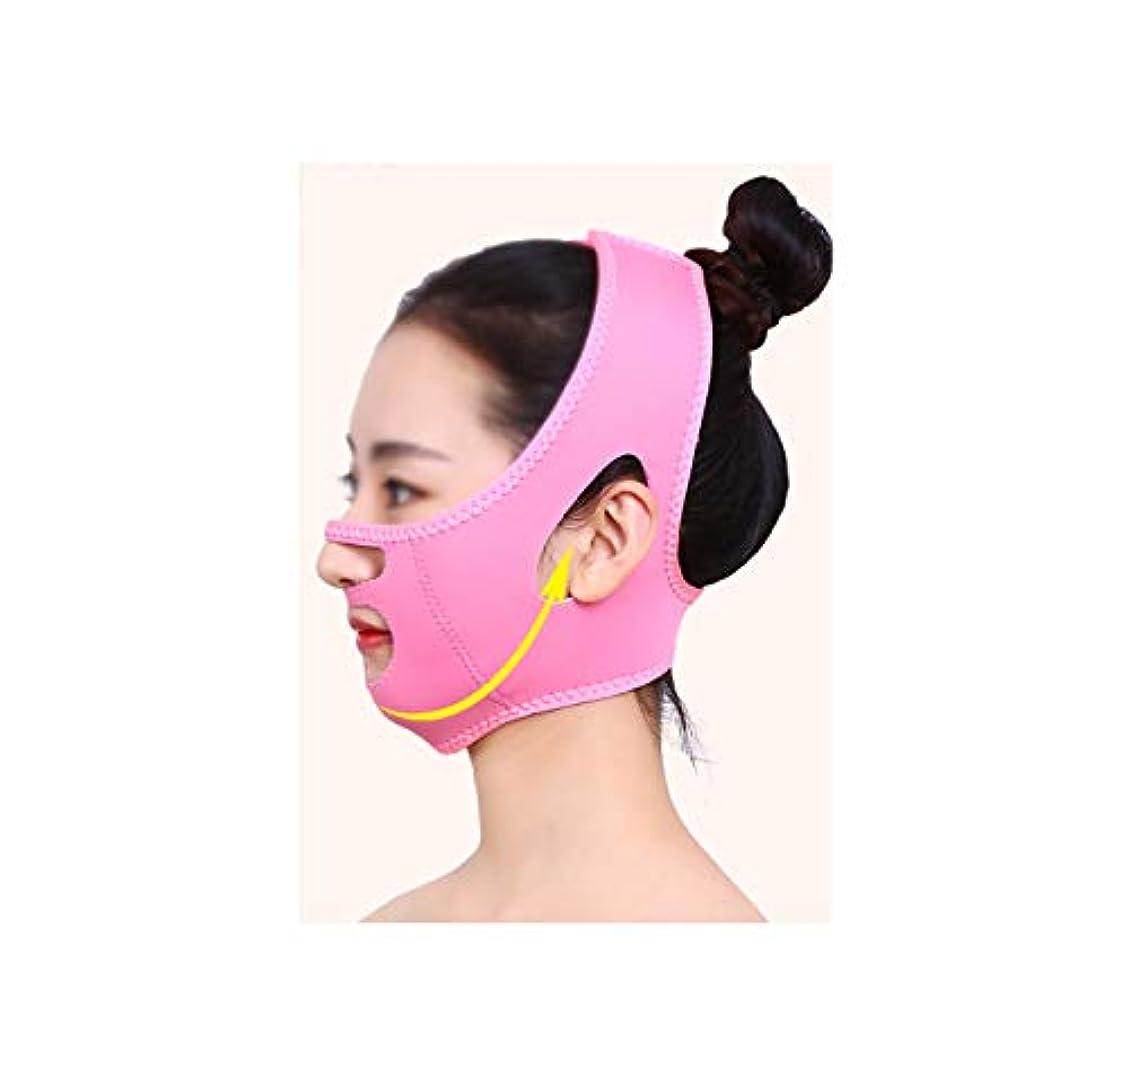 TLMY 薄い顔マスクマスク顔機美容機器ローラー顔薄い顔Vフェイスマスク二重あご包帯アーティファクト 顔用整形マスク